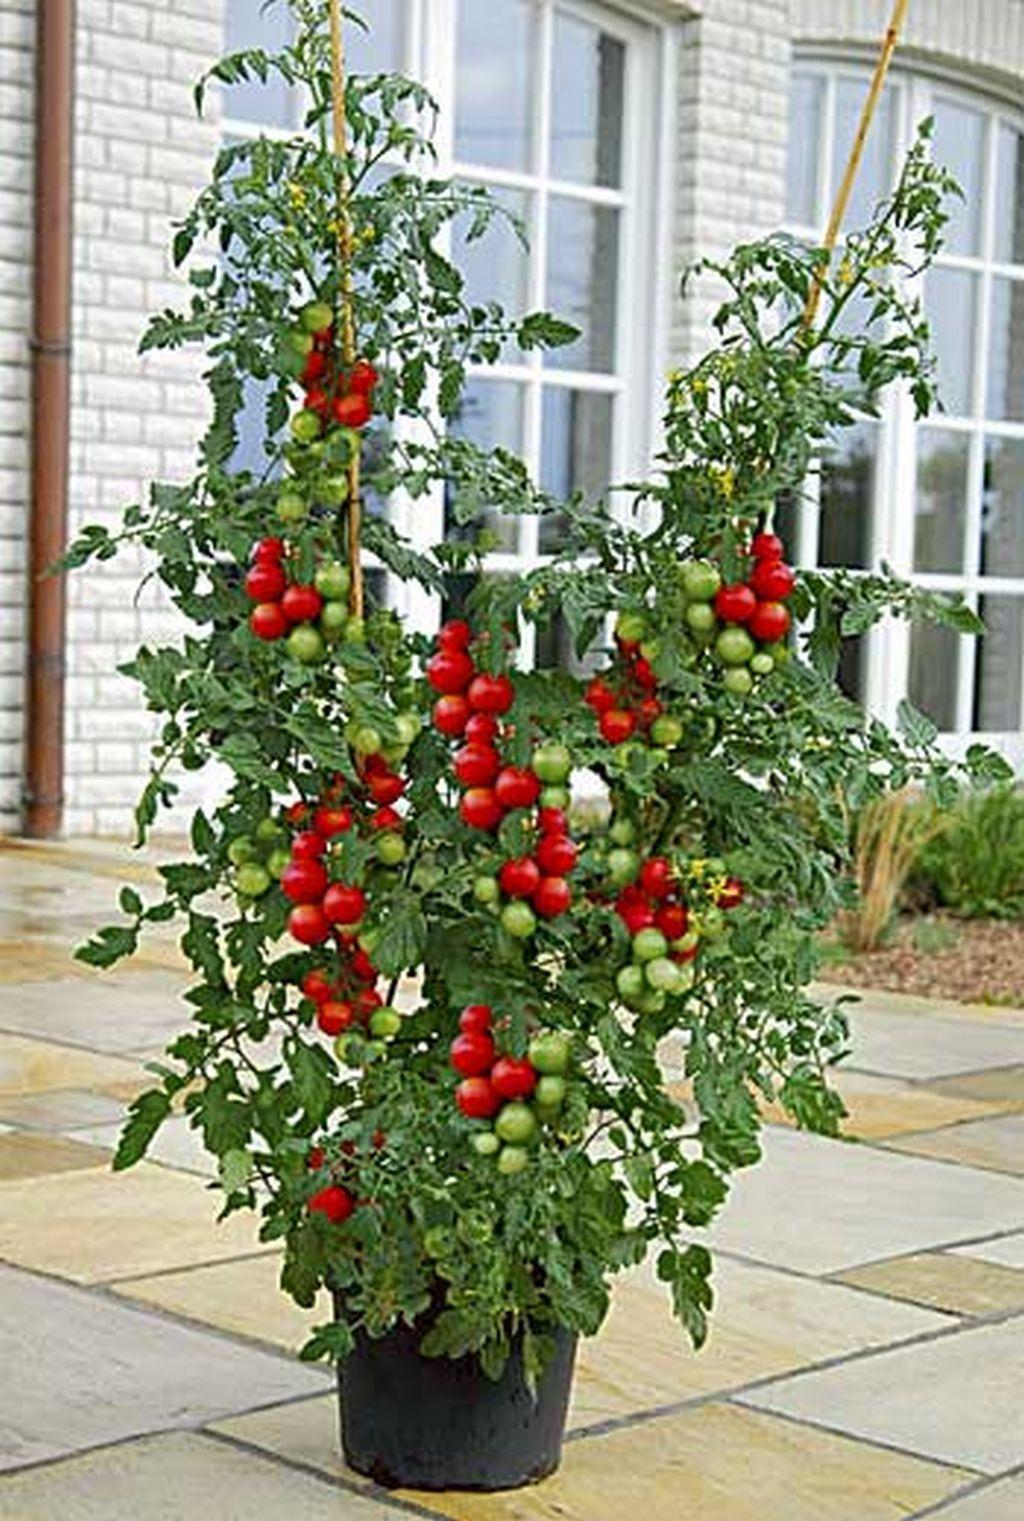 Tomato Tomaccio ® This Sundried Cherry Tomato Is One Of 640 x 480